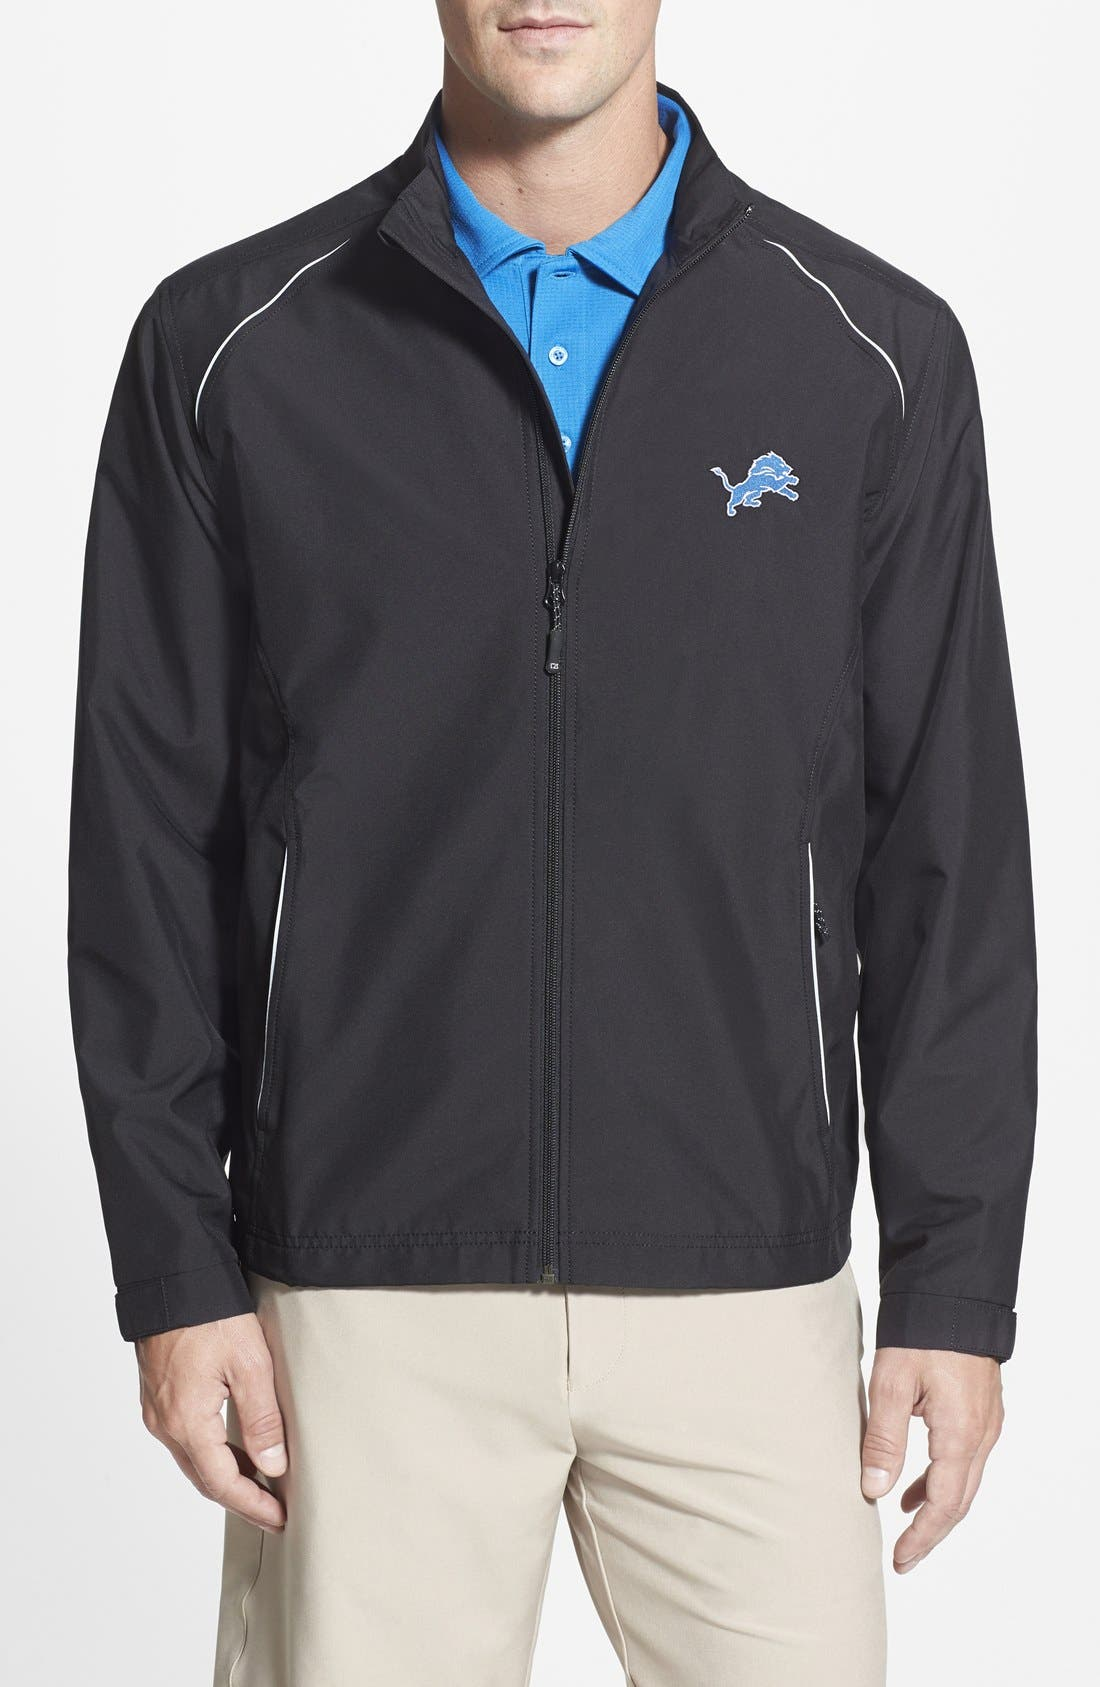 Cutter & Buck Detroit Lions - Beacon WeatherTec Wind & Water Resistant Jacket